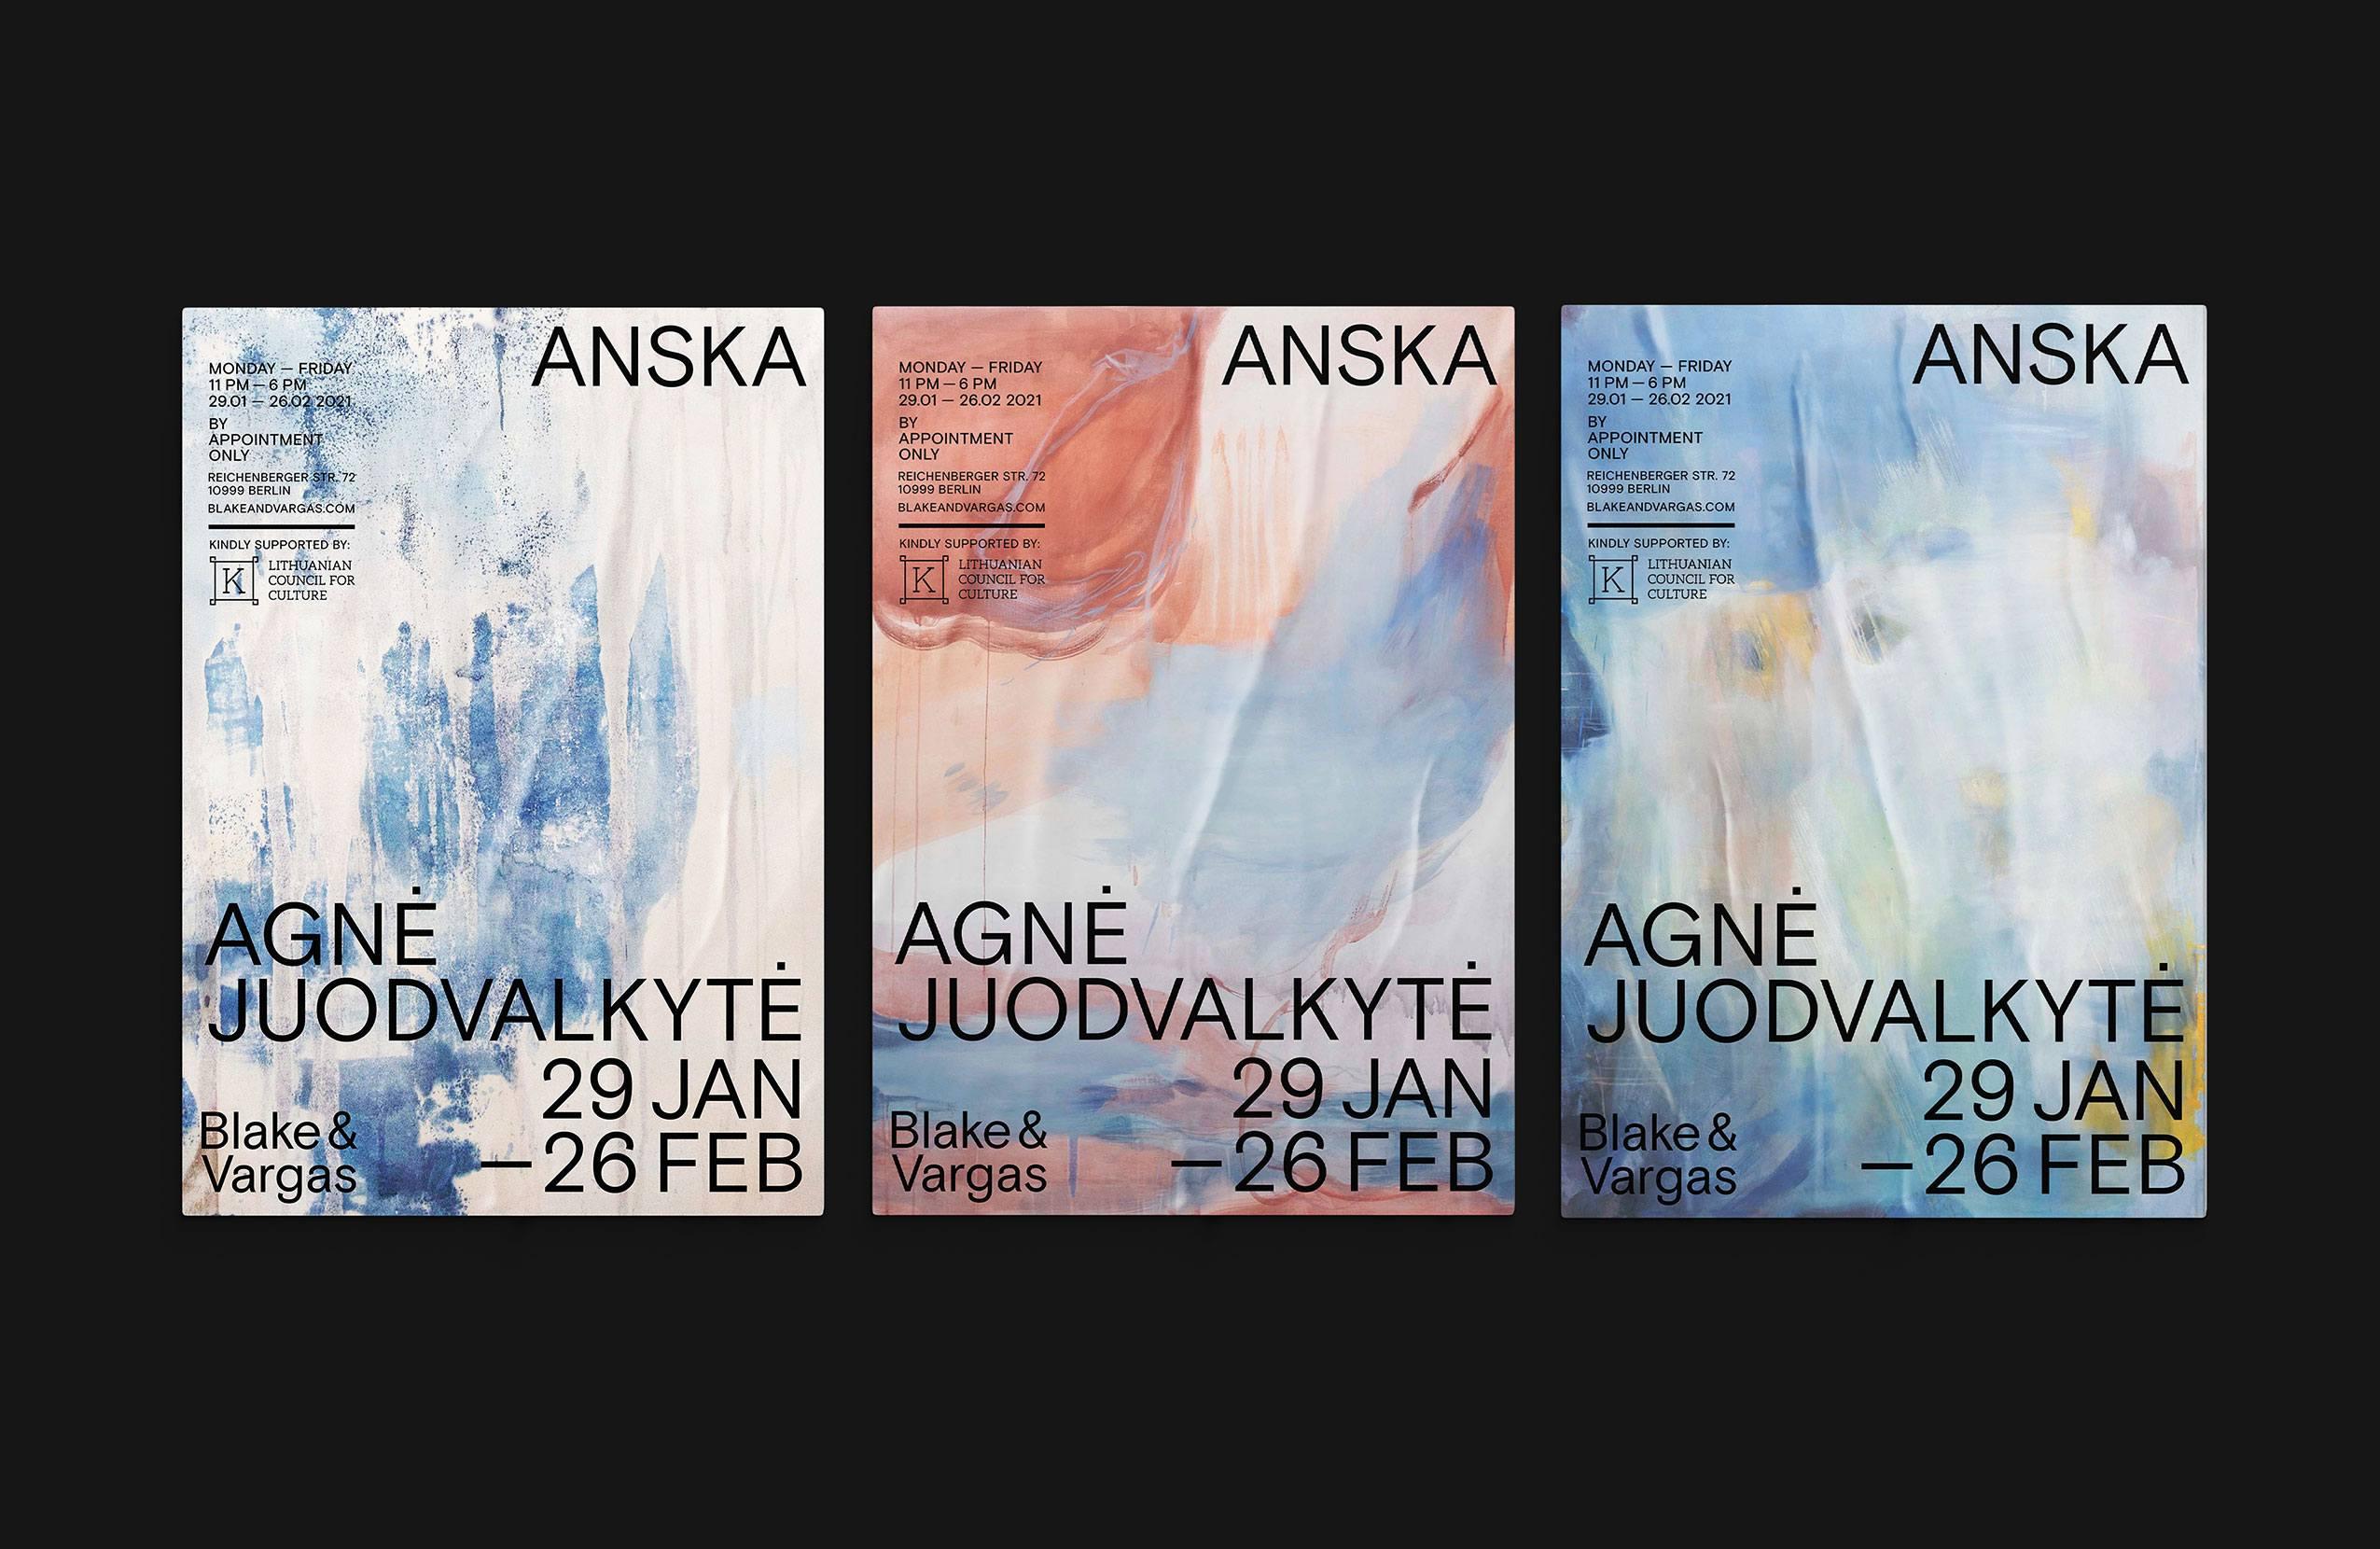 <p><em>AgnėJuodvalkytė</em> / ANSKA – Posters</p>